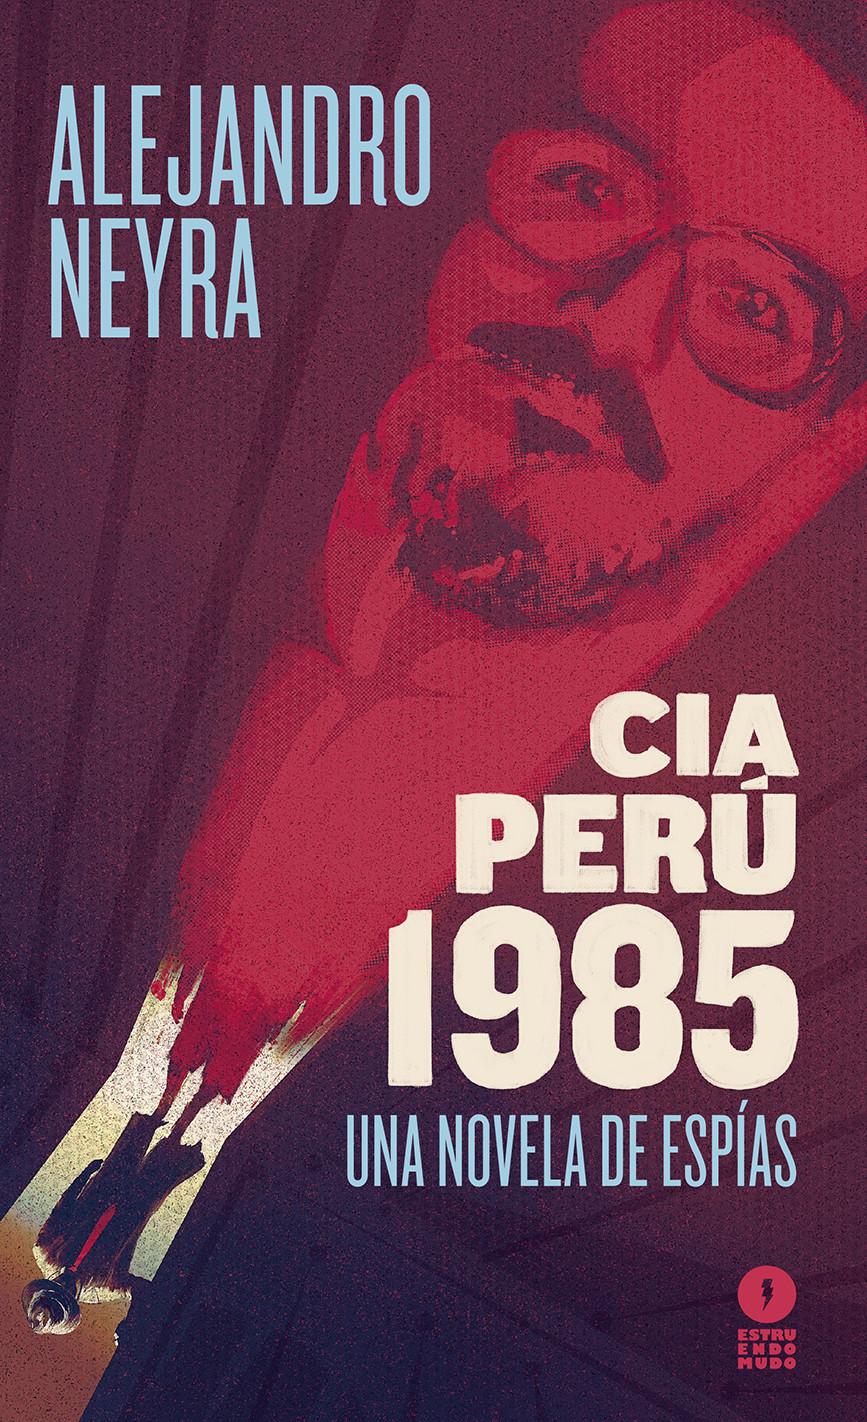 CIA Perú 1985.  Una novela de espías